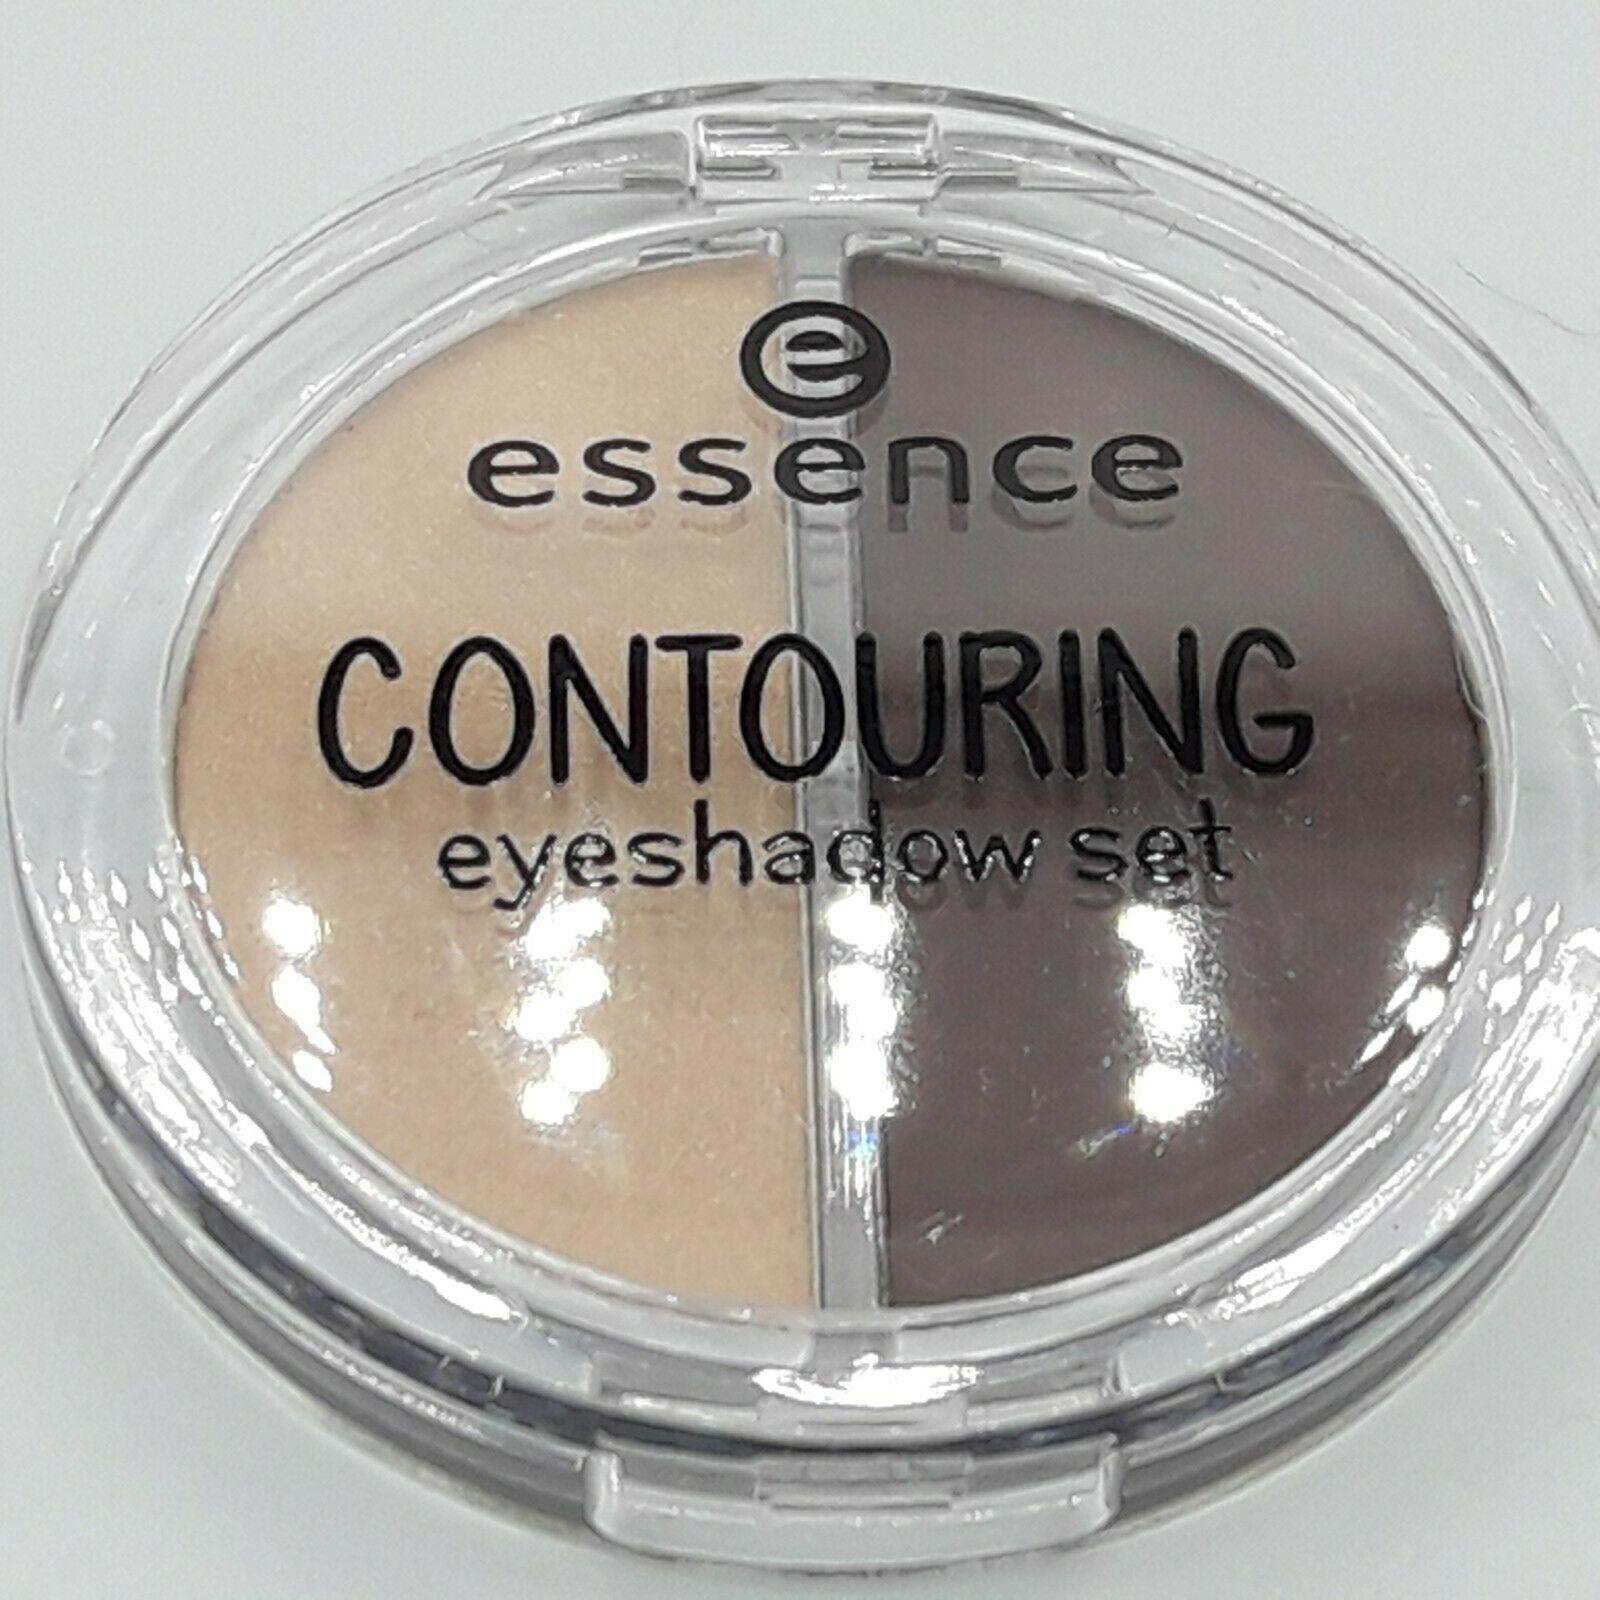 Essence Contouring Duo Eyeshadow Set 04 Coffee N' Cream - $6.68